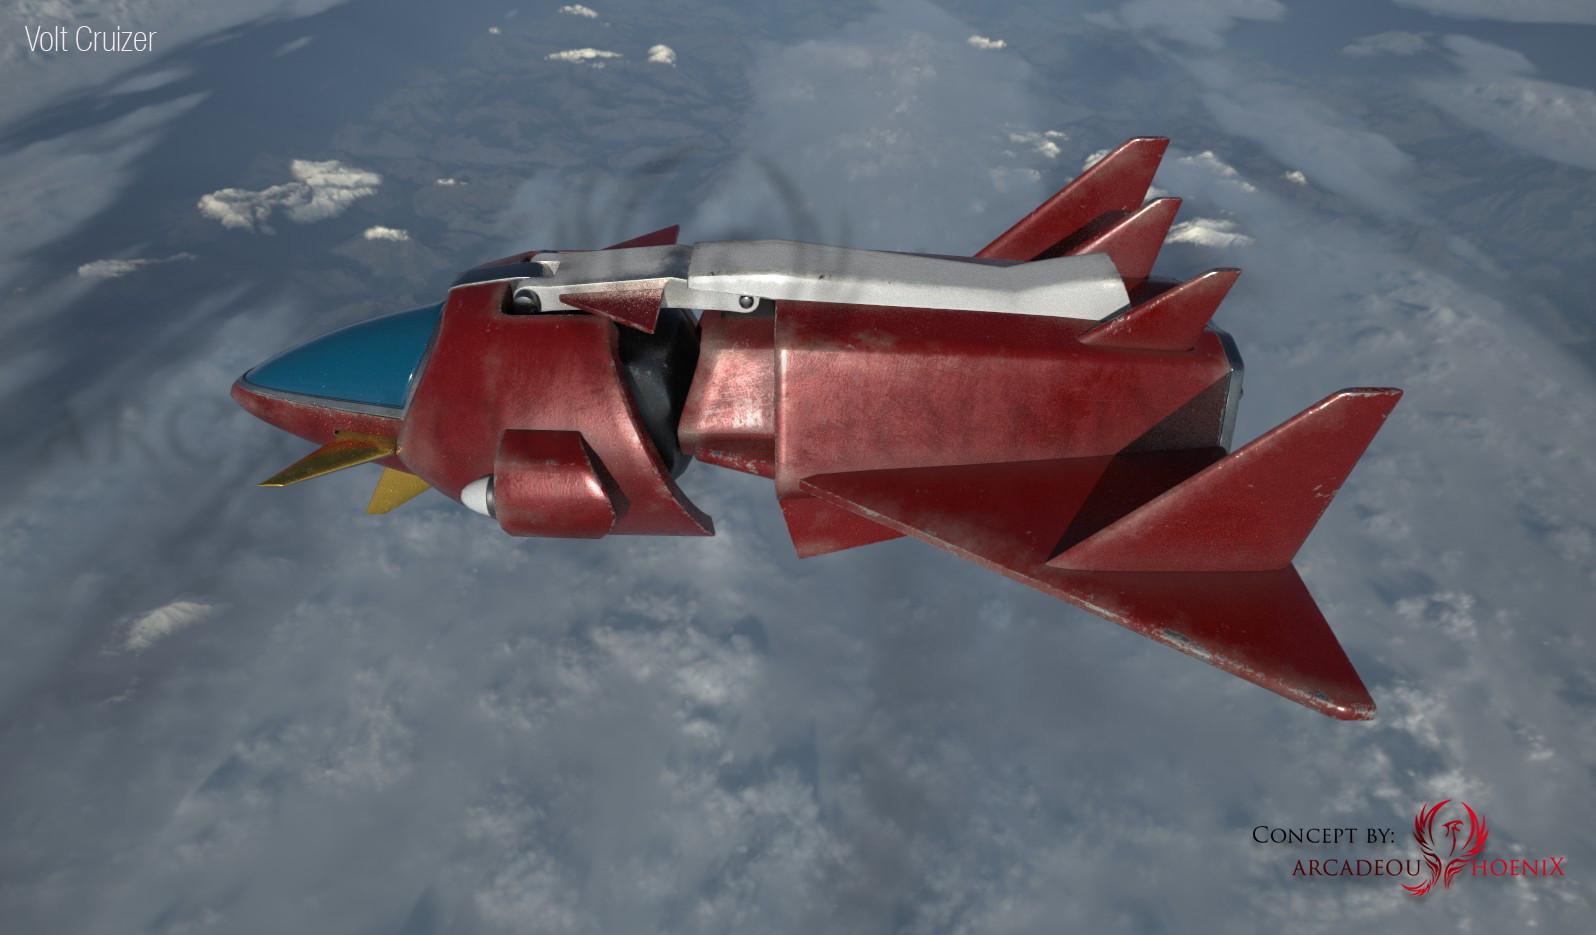 Arcadeous phoenix volt cruiser cam2